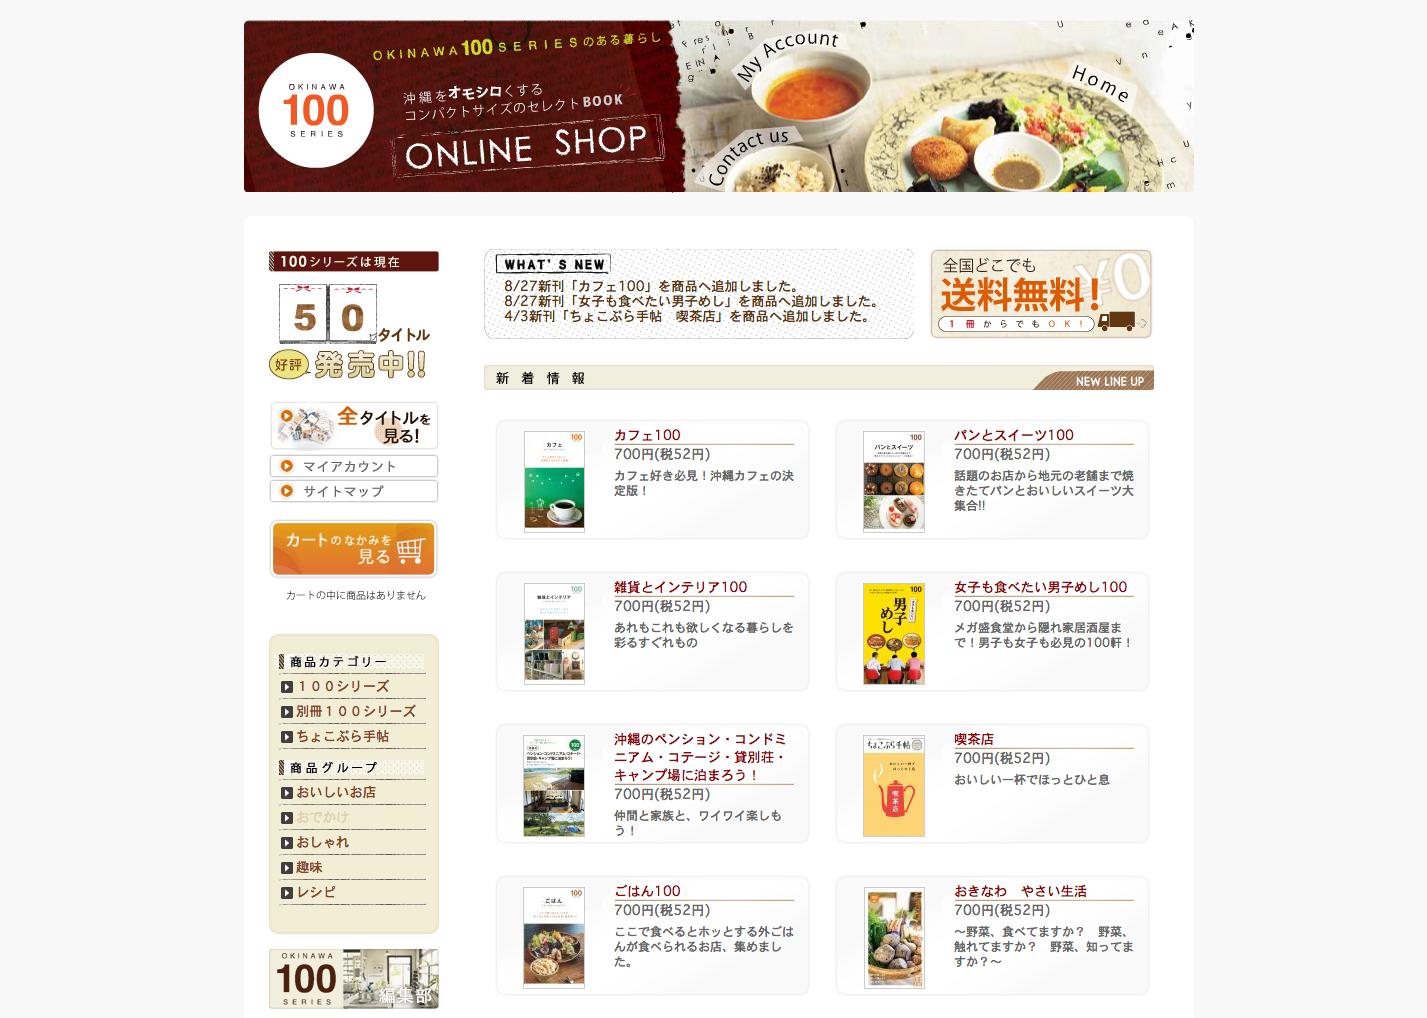 okinawa100